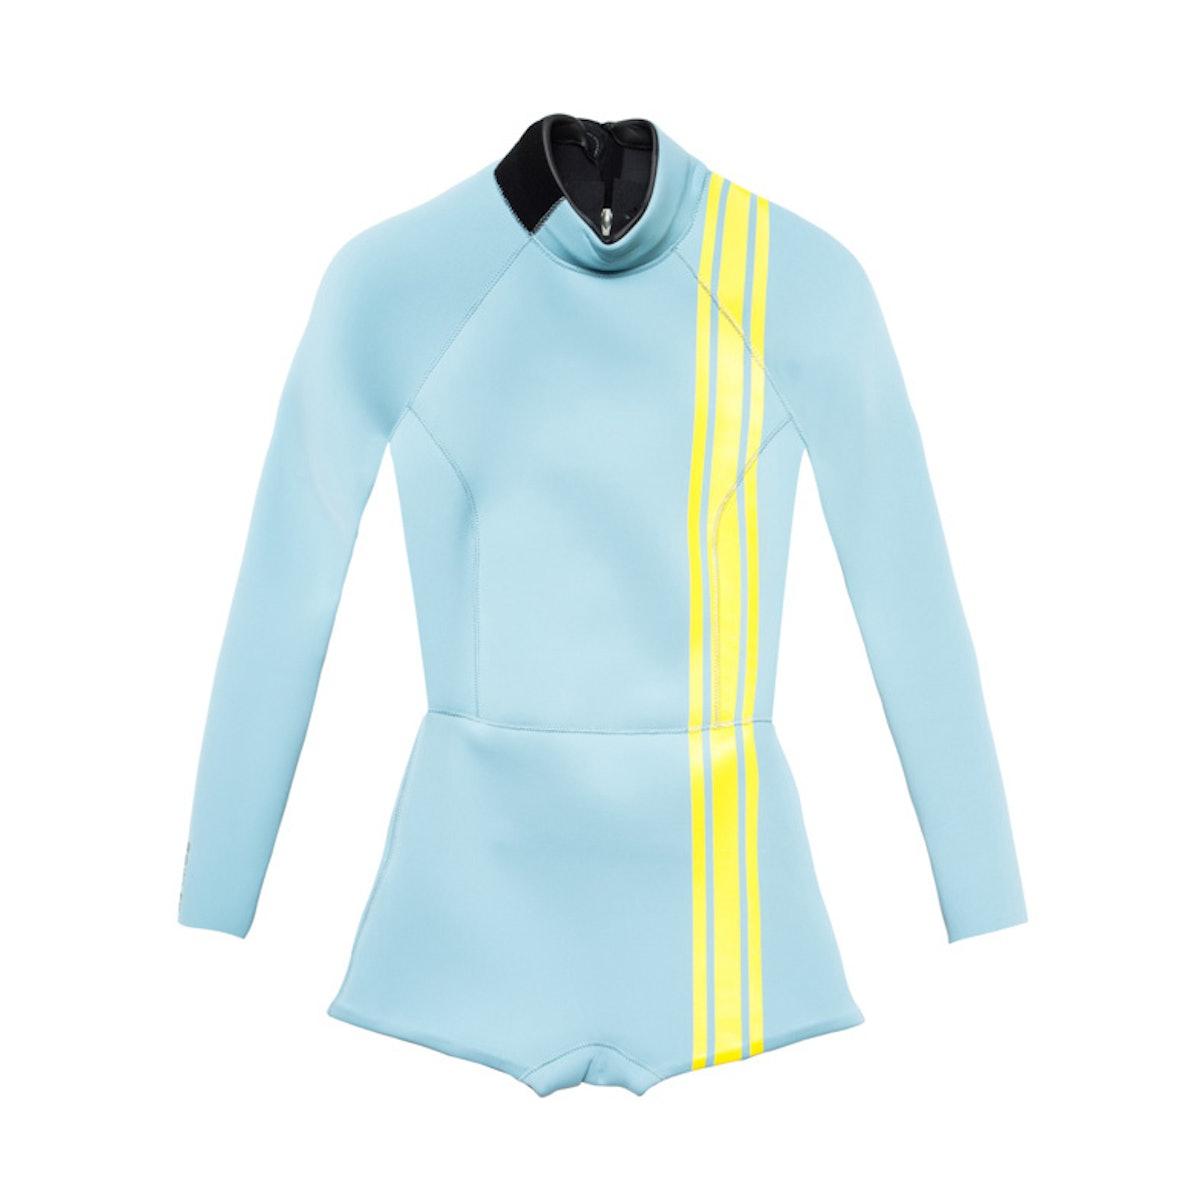 Cynthia Rowley wet suit